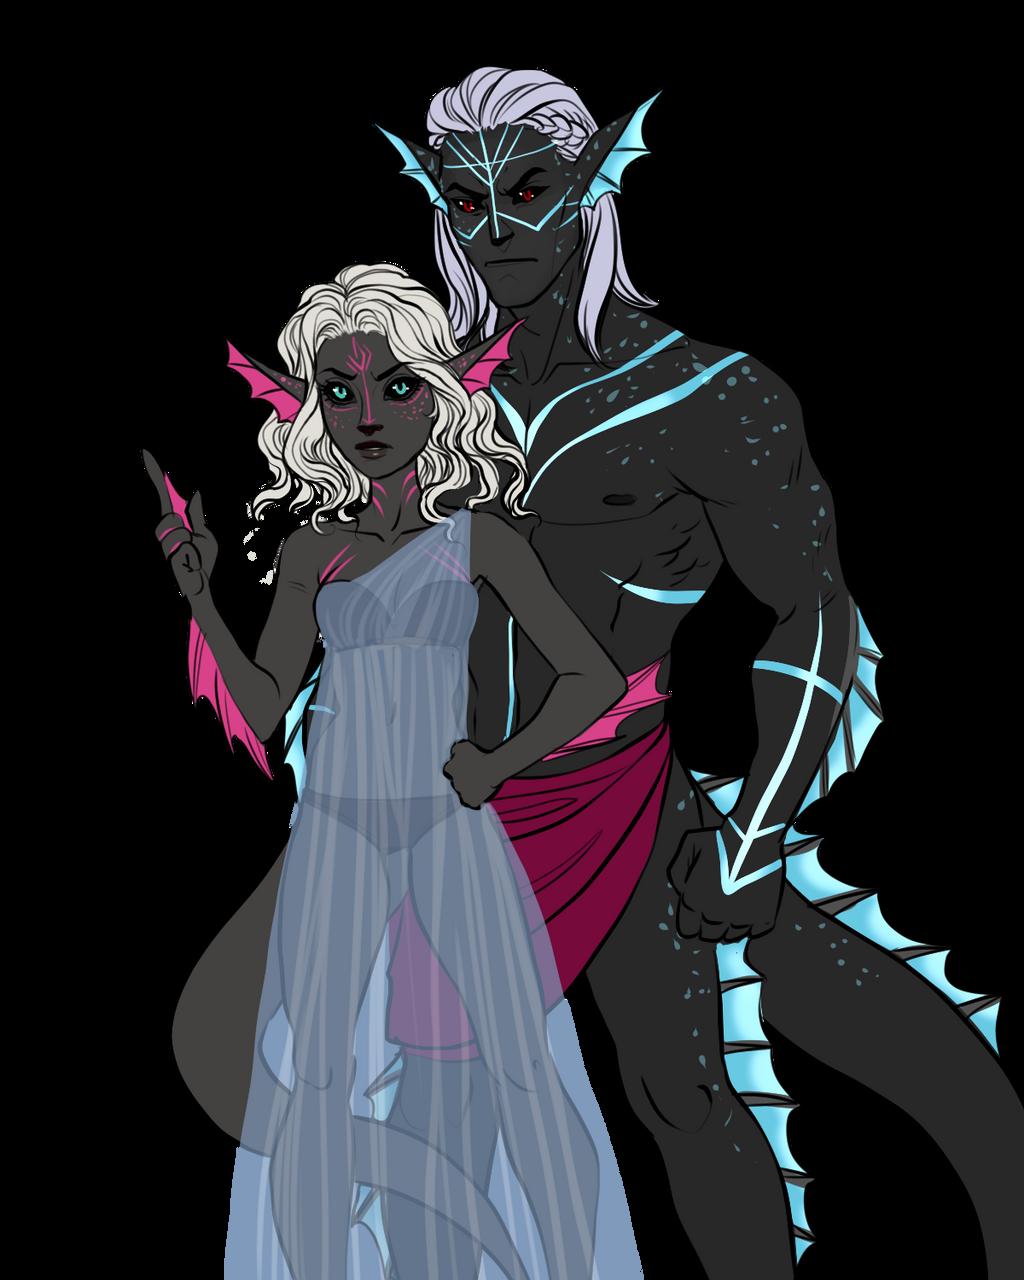 Couples Sketch Color Davina And Orbis By Blackbirdink On Deviantart